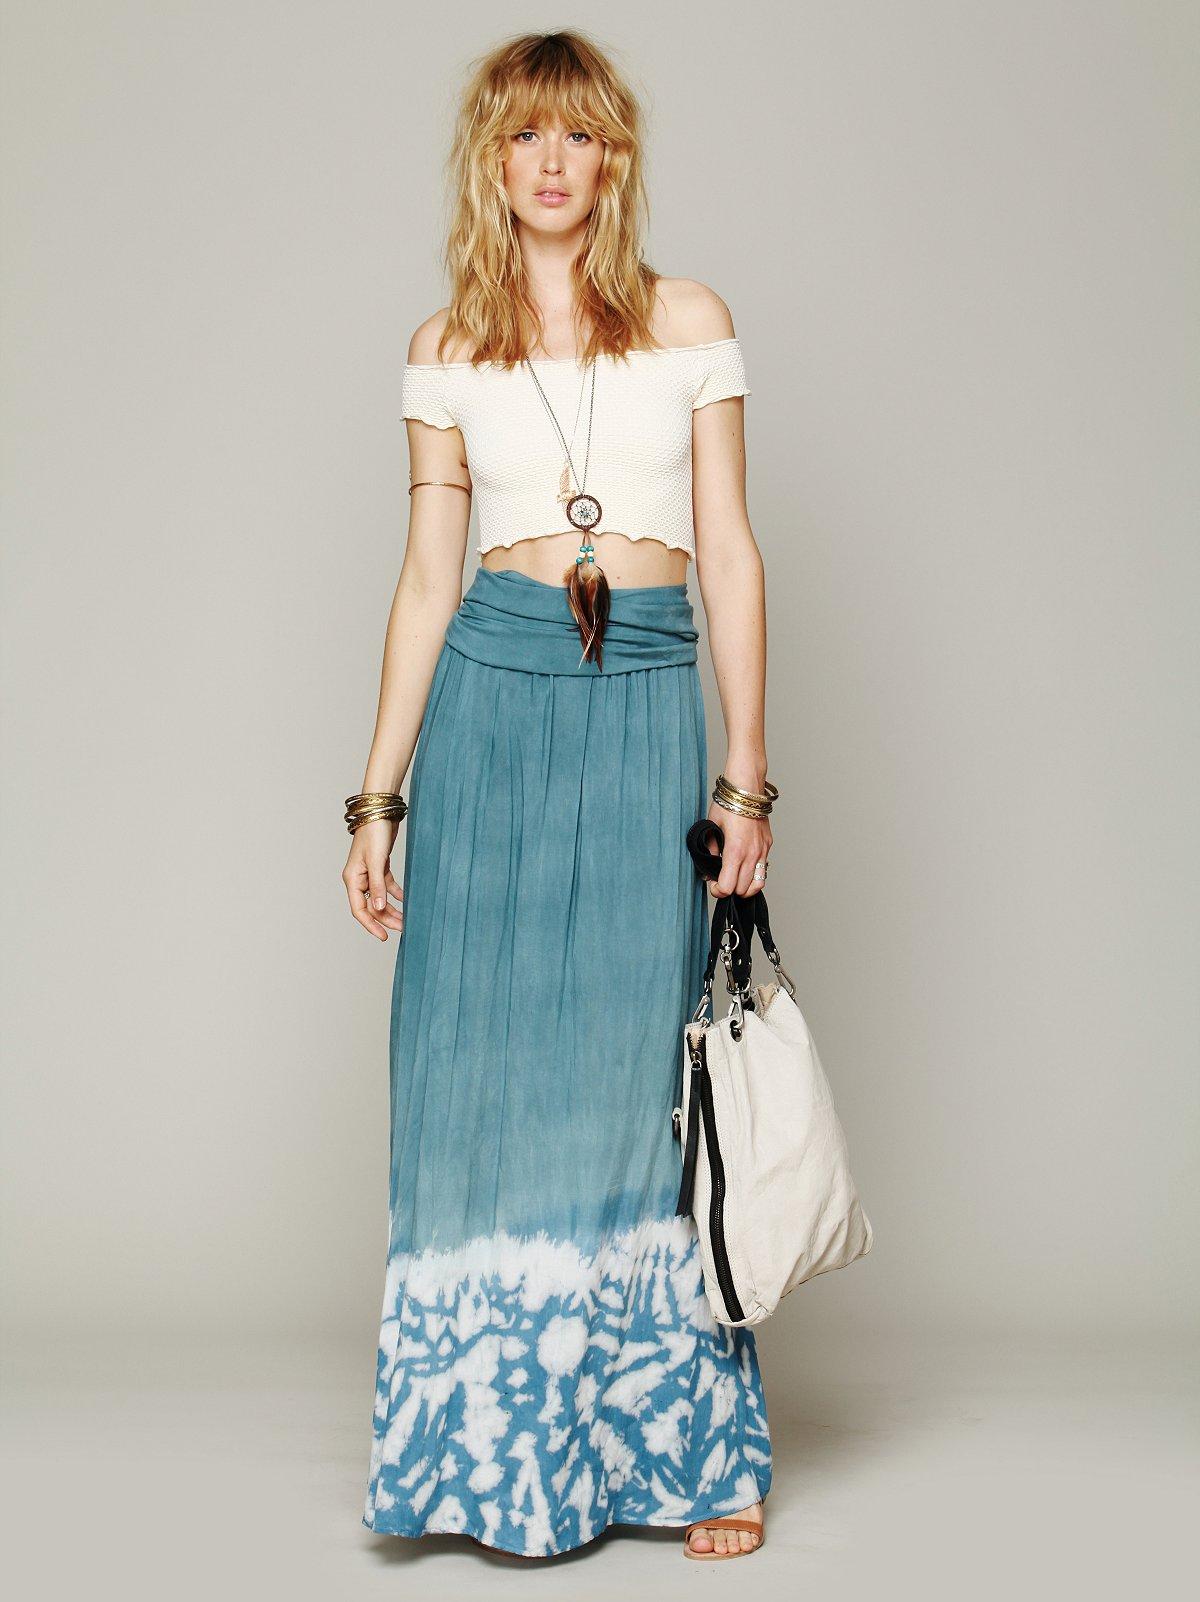 Convertible Tie Dye Skirt